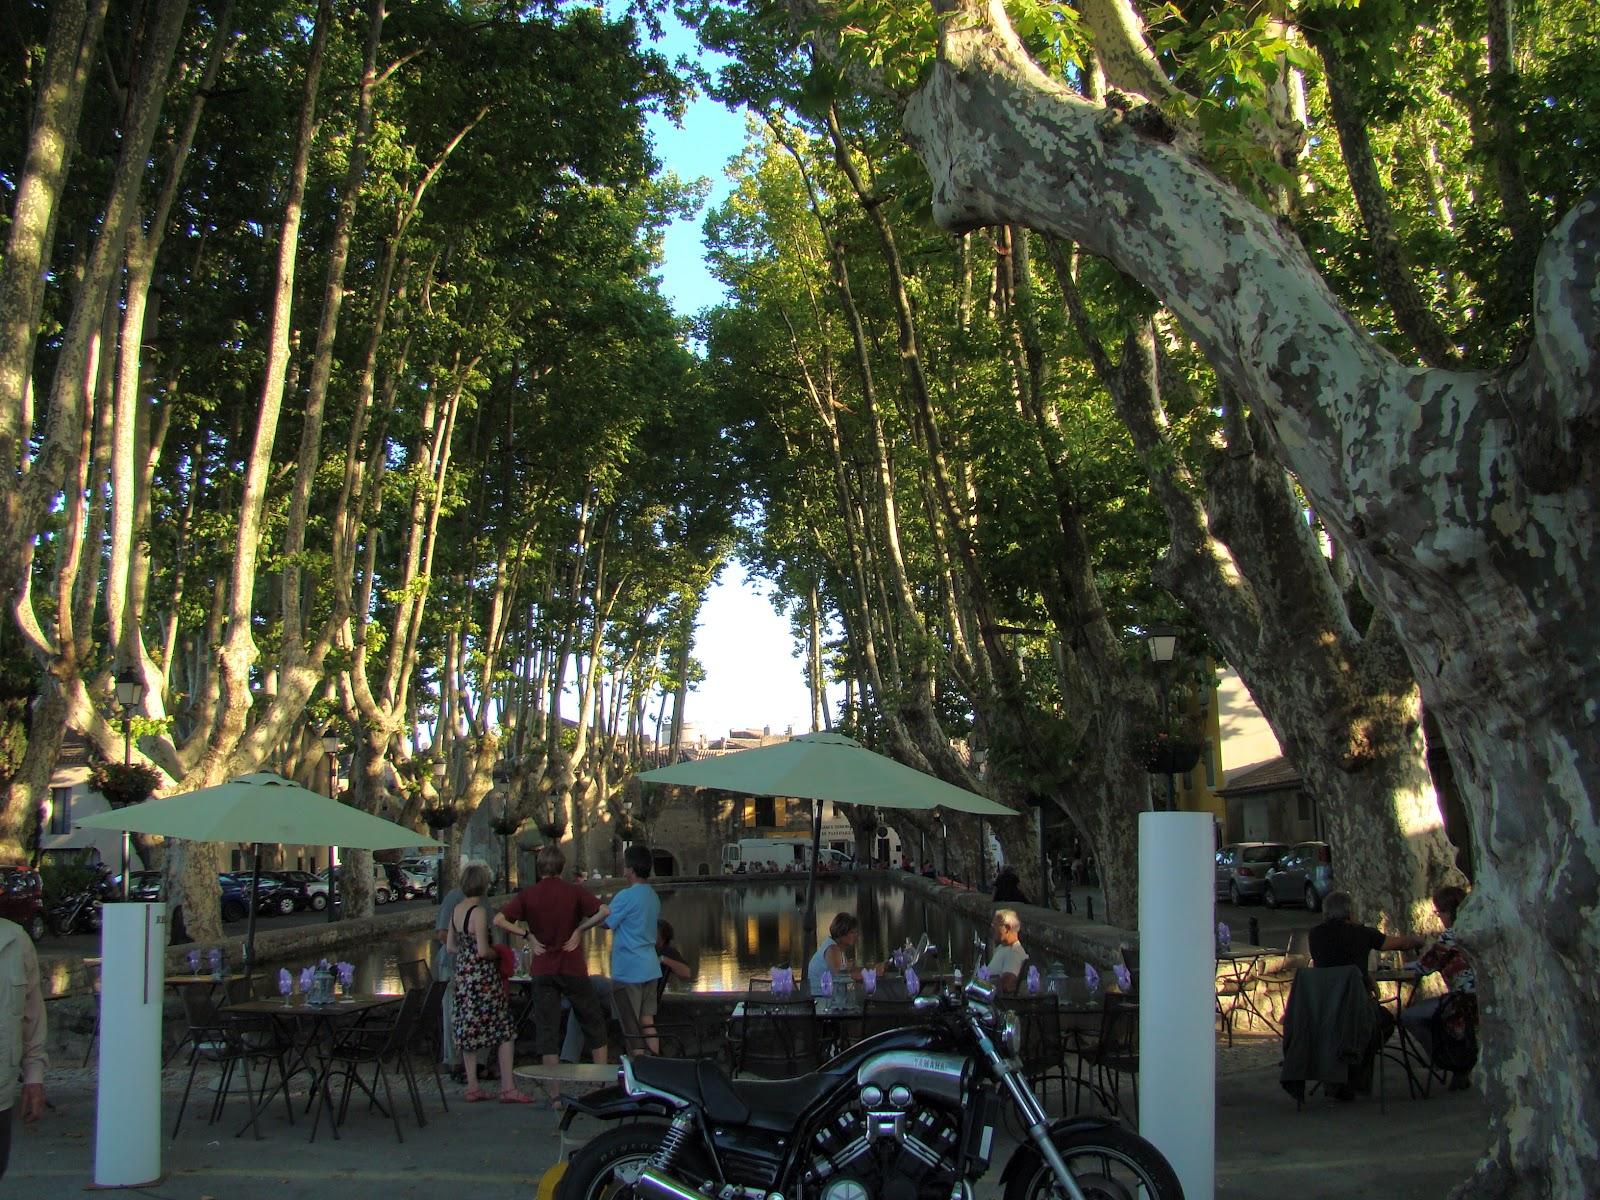 http://4.bp.blogspot.com/-HkhD59TL4XI/T4CwHxDvg9I/AAAAAAAAAQU/gkvZv_d-nWY/s1600/Cucuron+square+with+restaurants.JPG